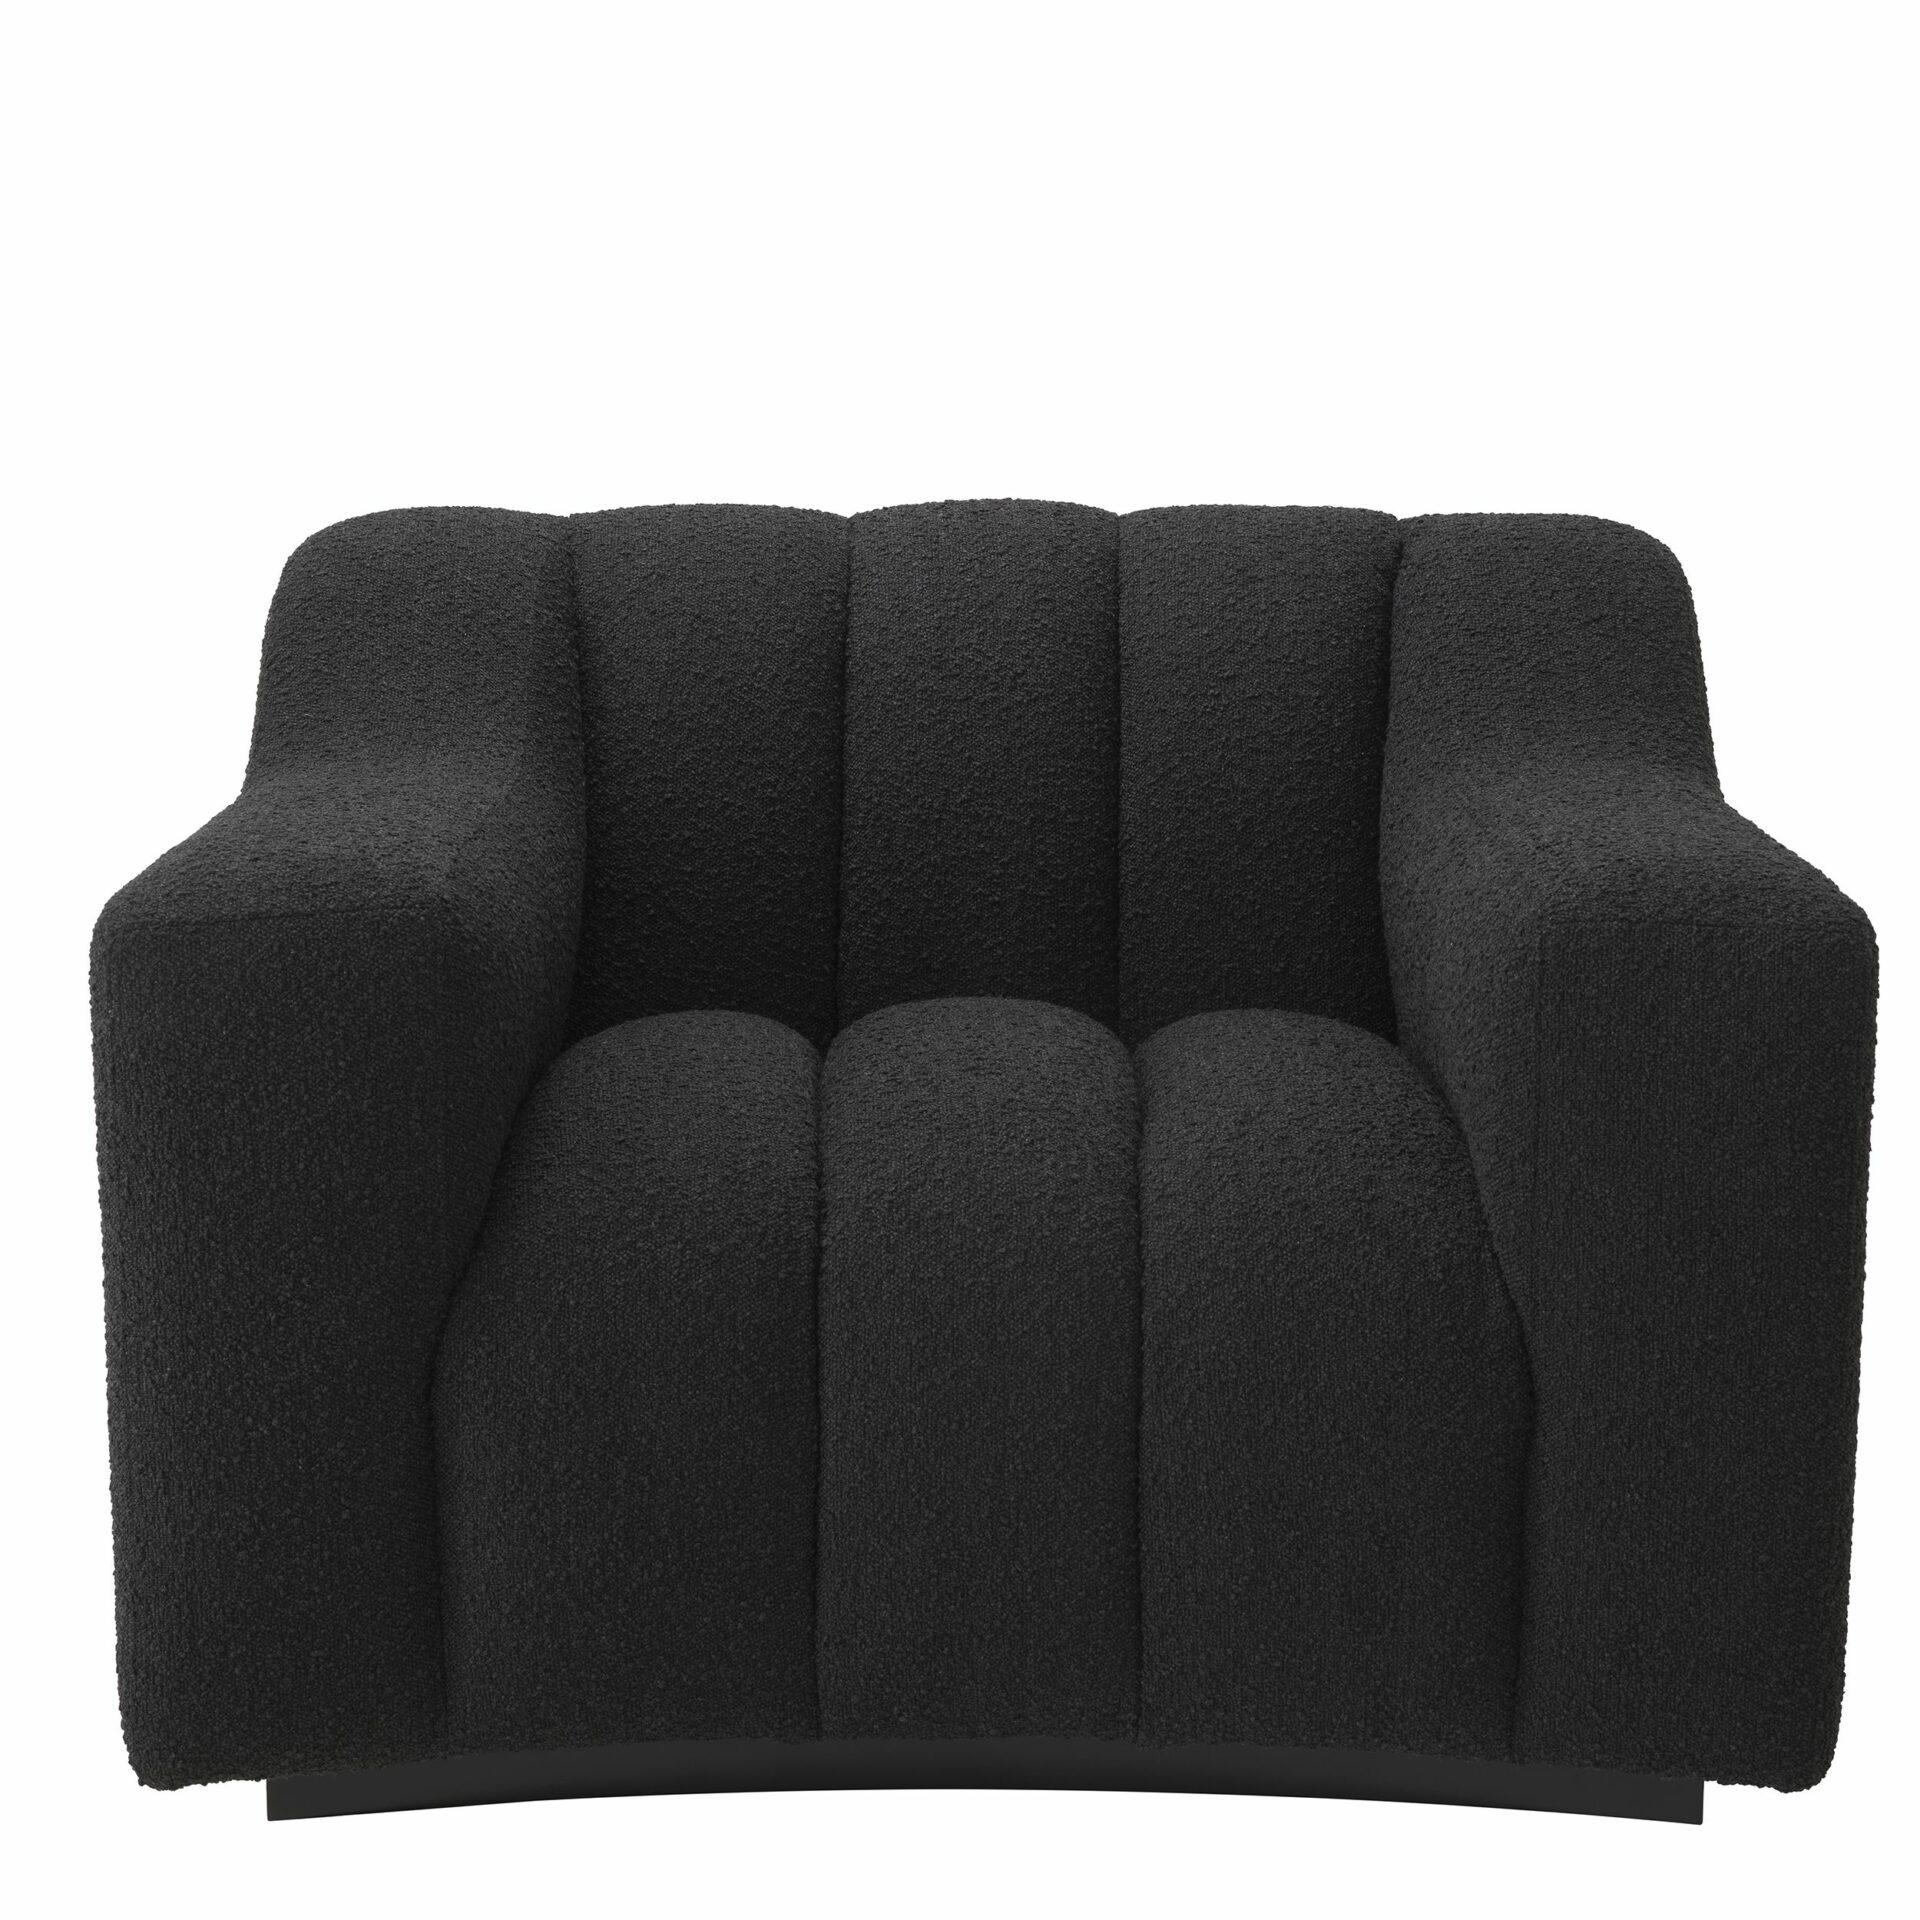 eichholtz-chair-kelly-black